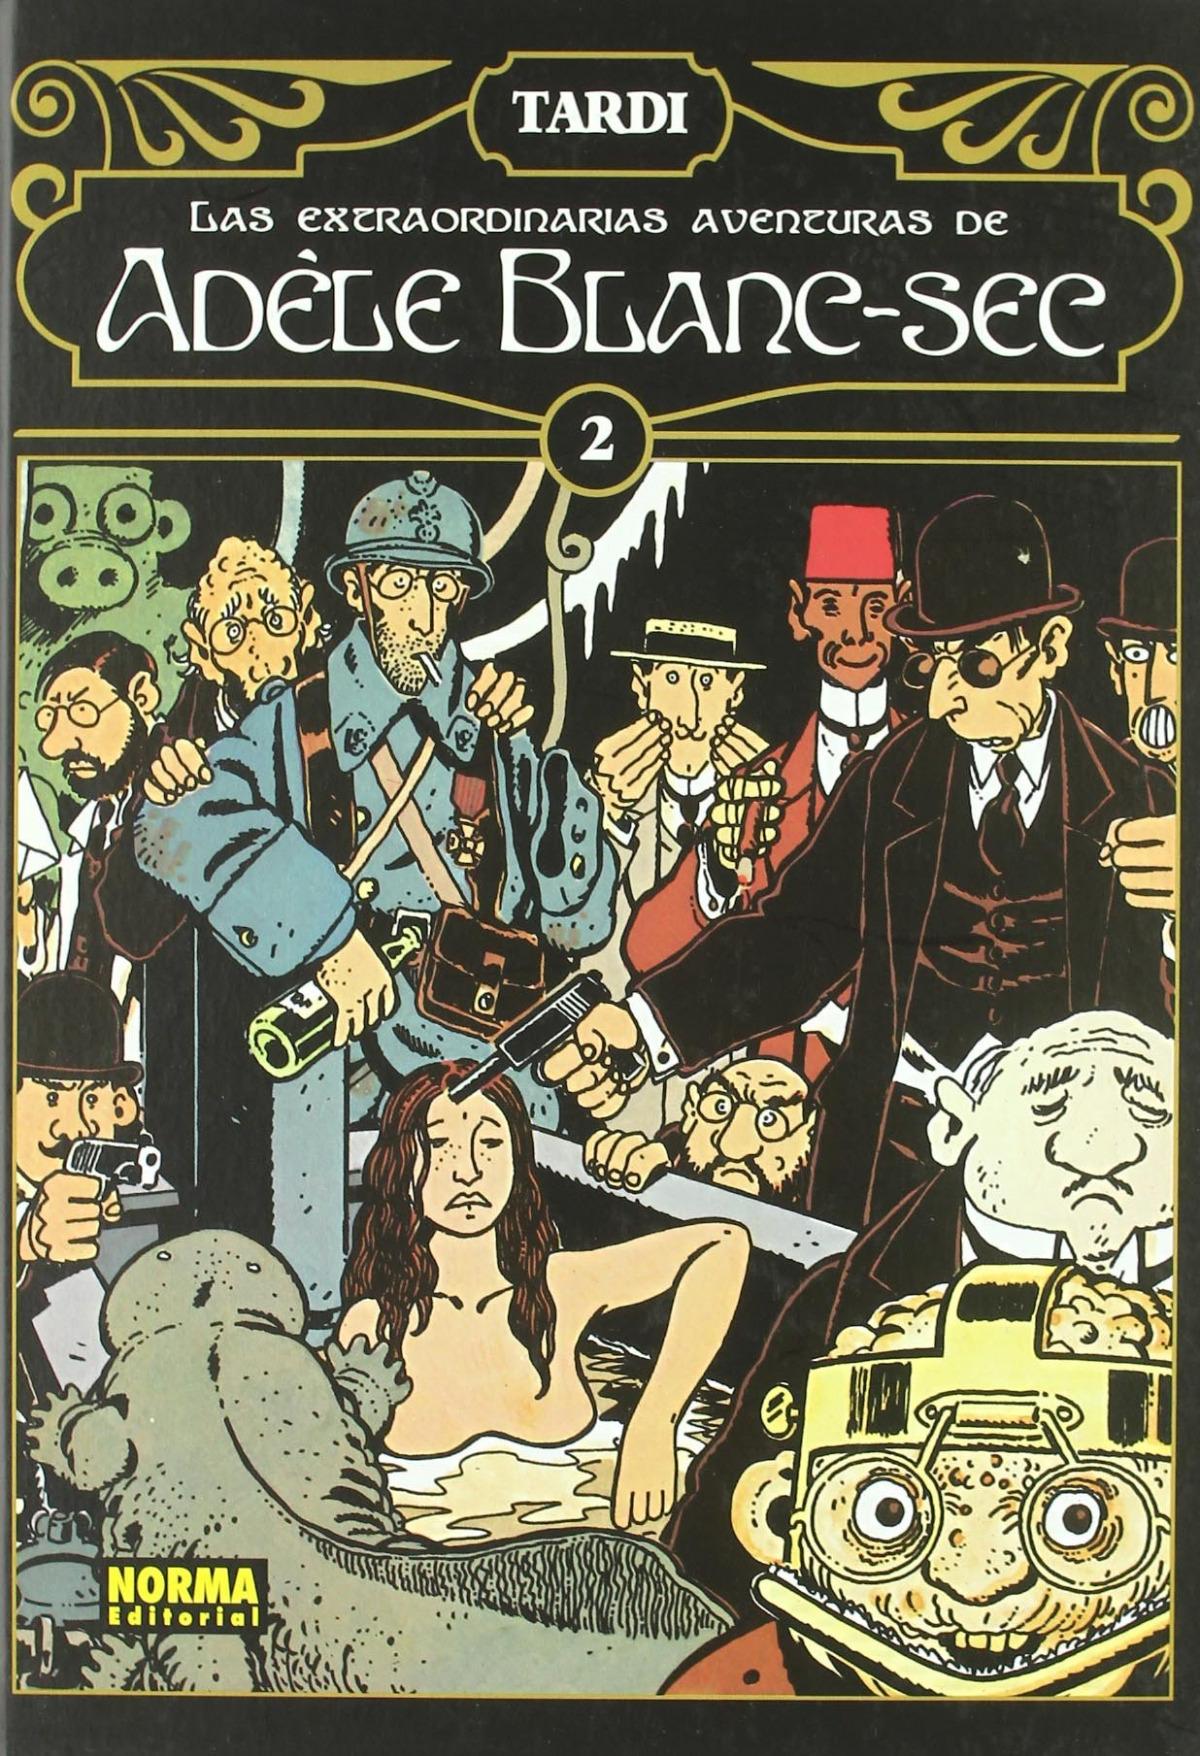 Adele blanc-sec vol.2